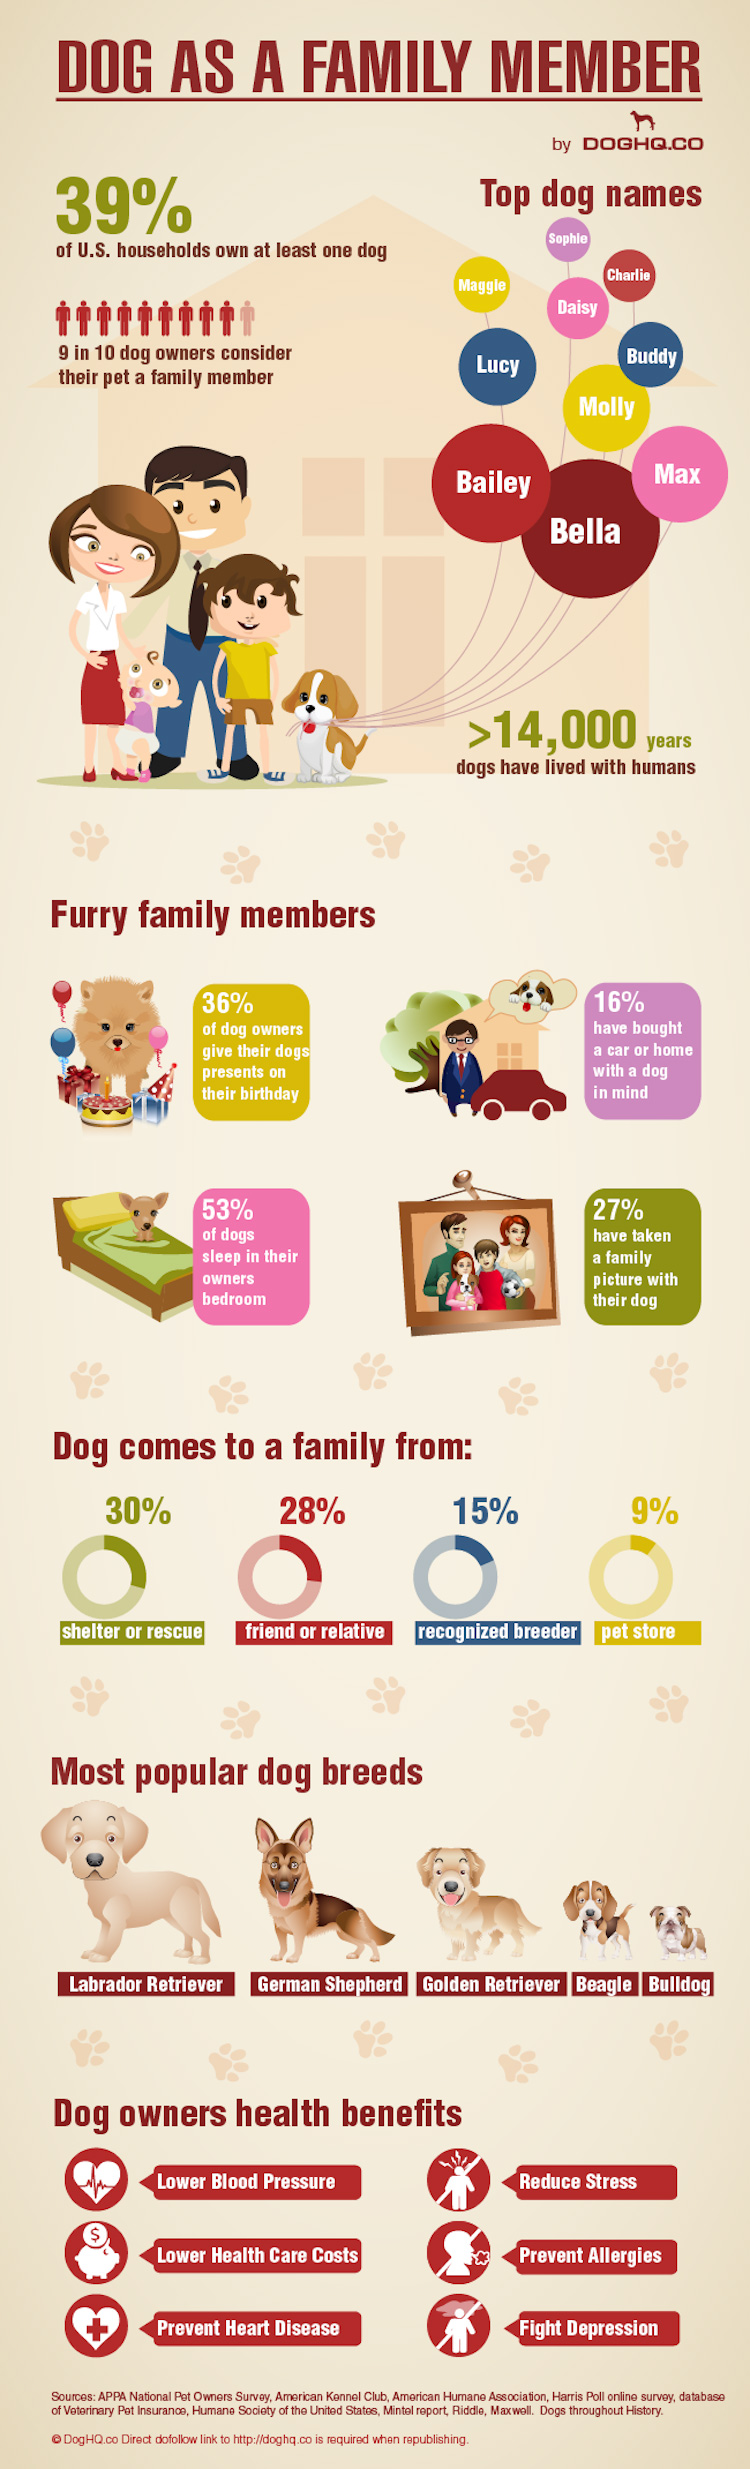 Dog-as-a-family-member